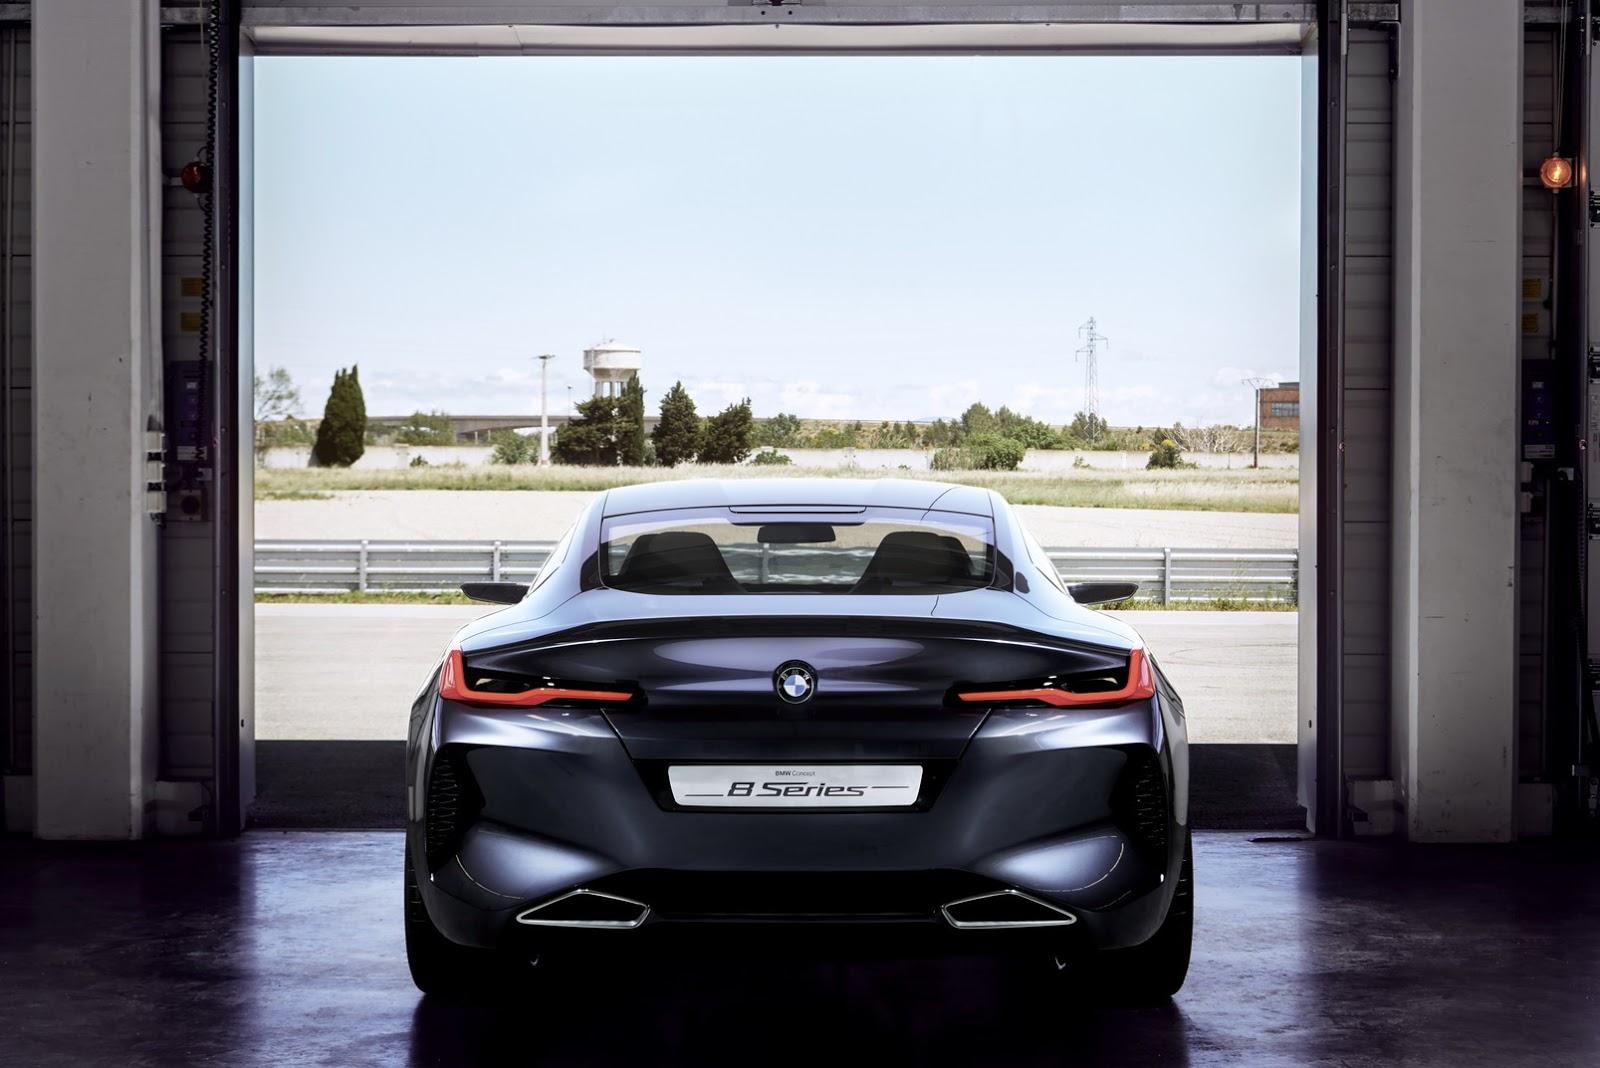 BMW_Concept_8_Series_36